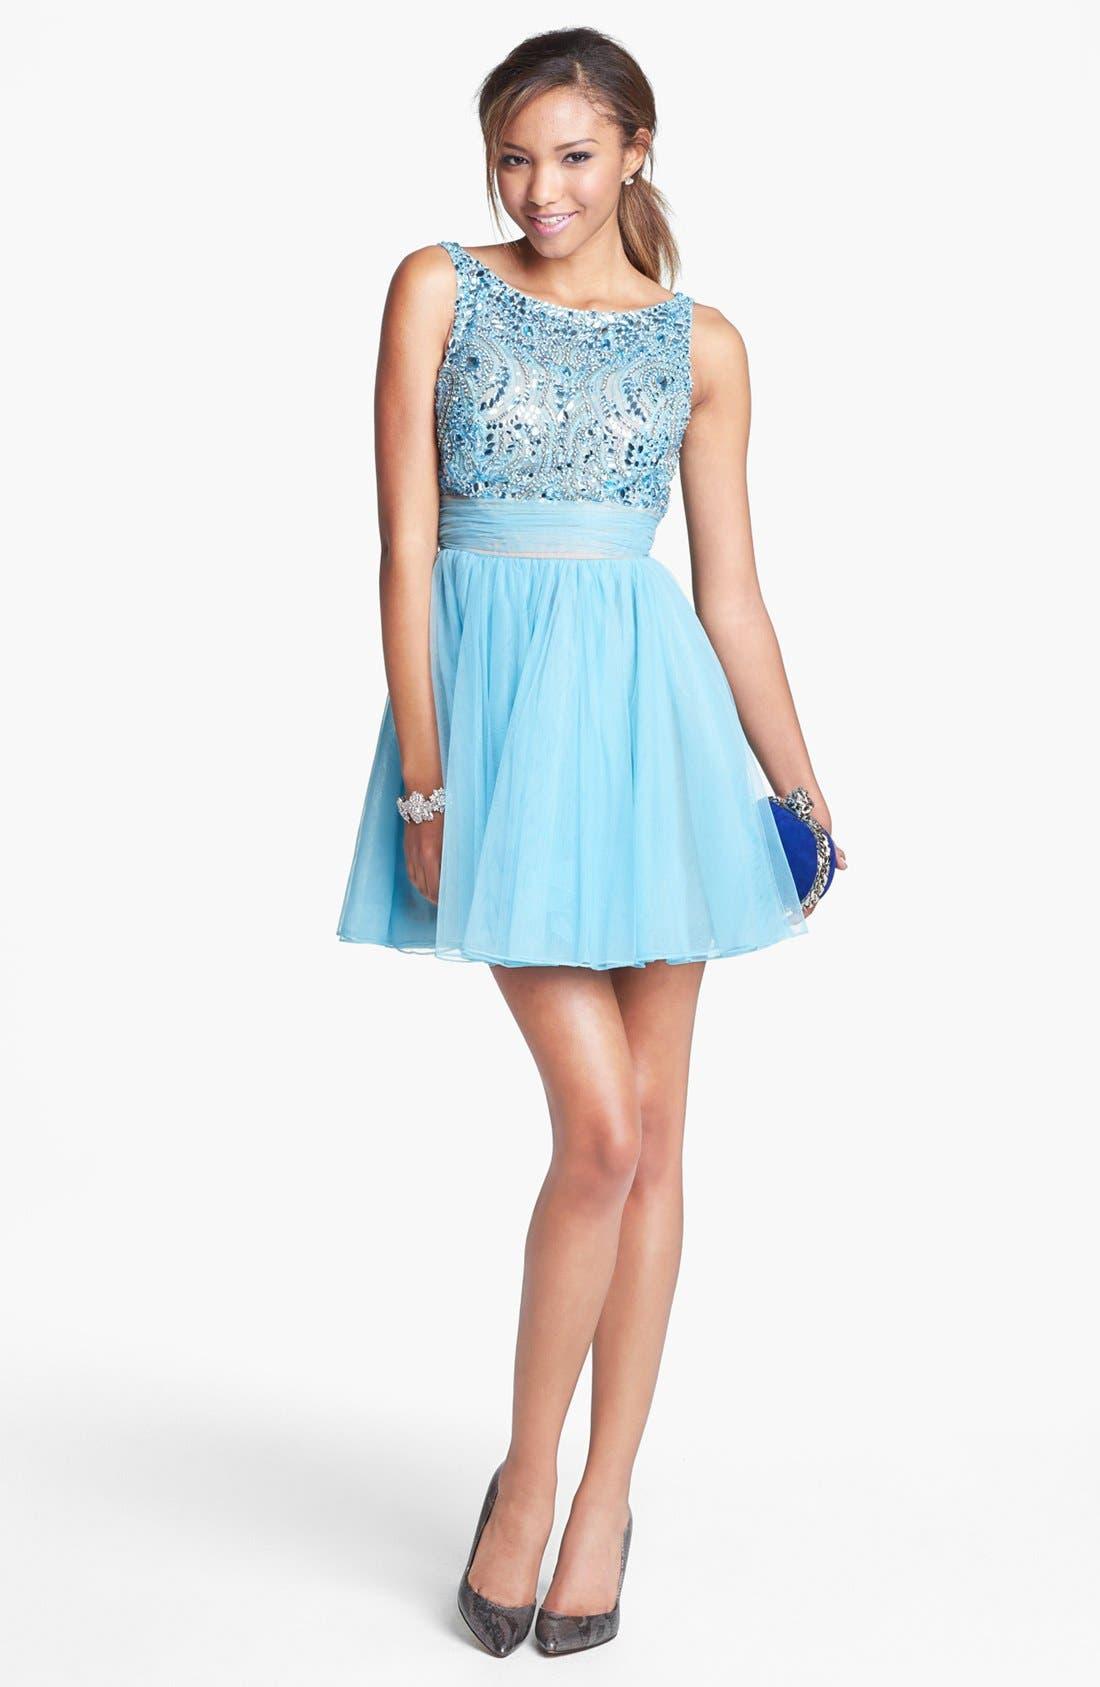 Alternate Image 1 Selected - Sherri Hill Embellished Tulle Fit & Flare Dress